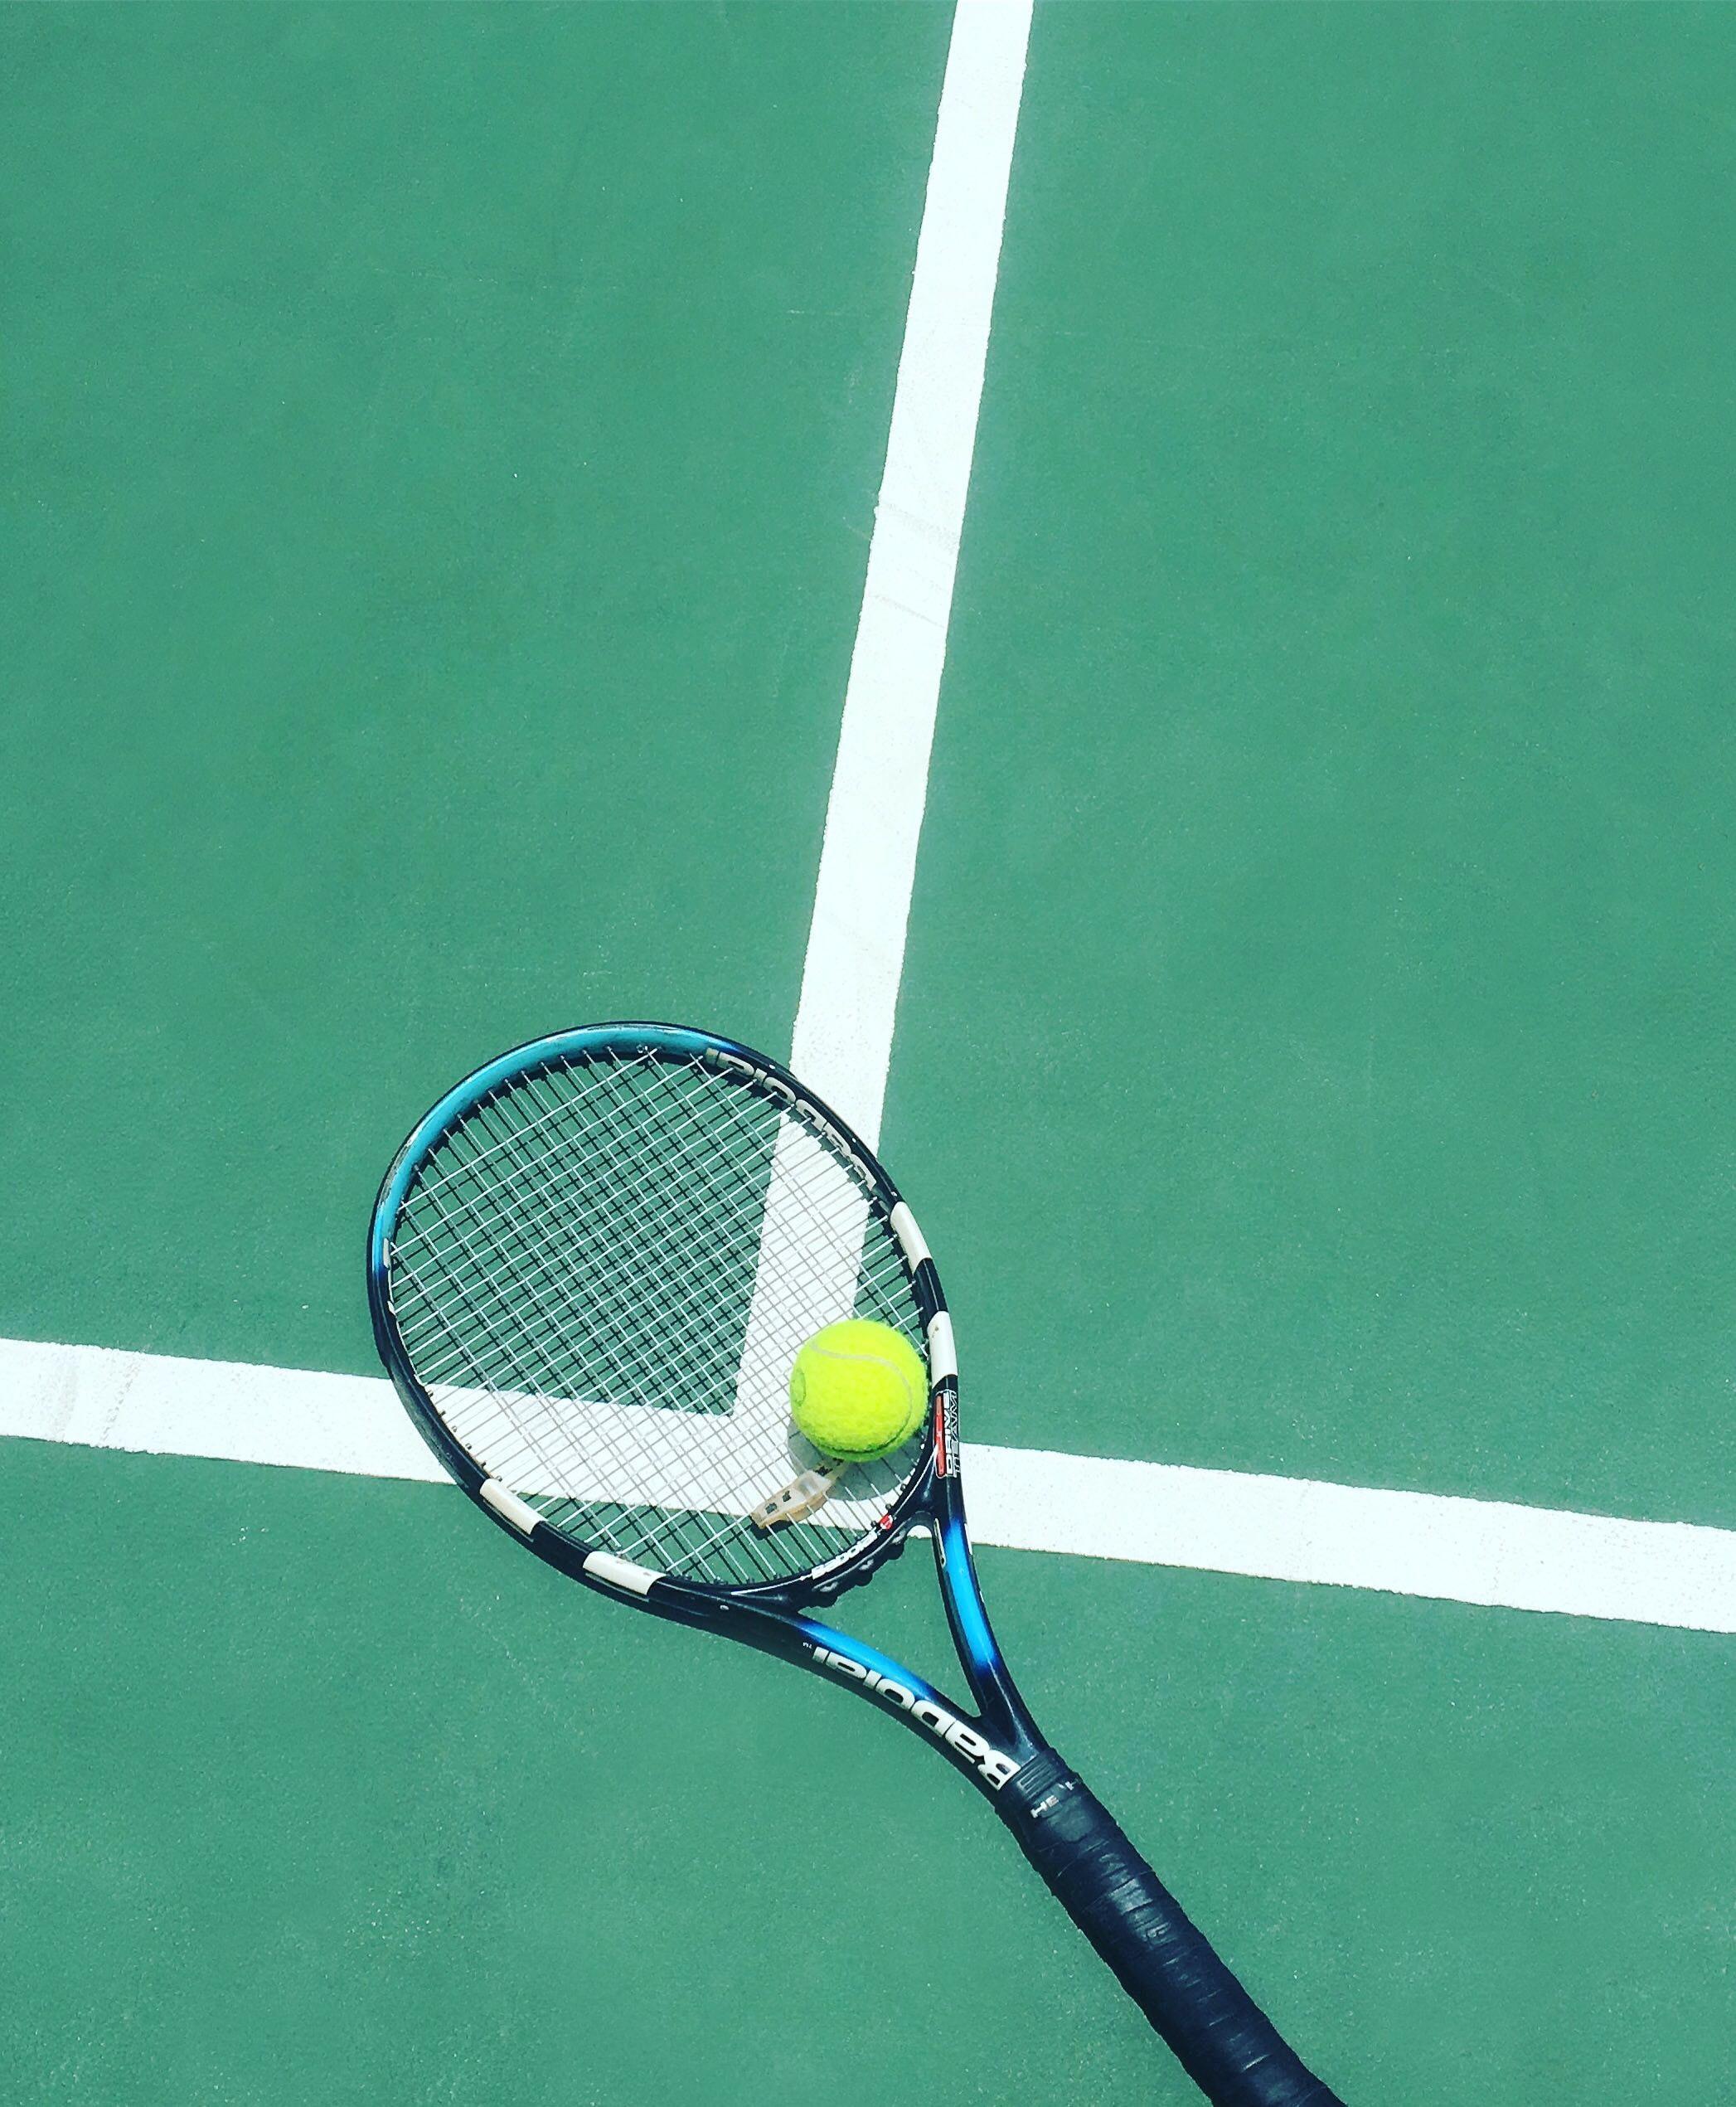 Tennis Racket And Ball On Field Photo Free Image On Unsplash